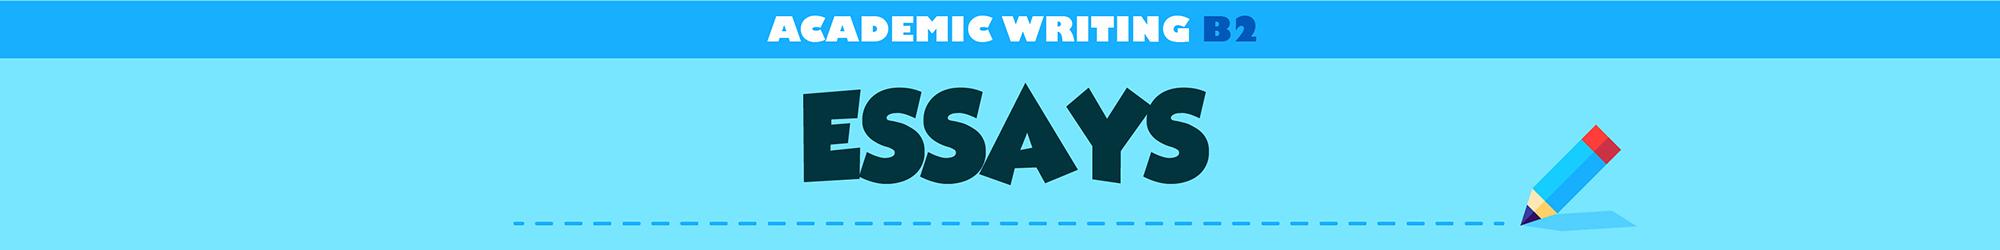 Academic Writing B2 (Essays) banner